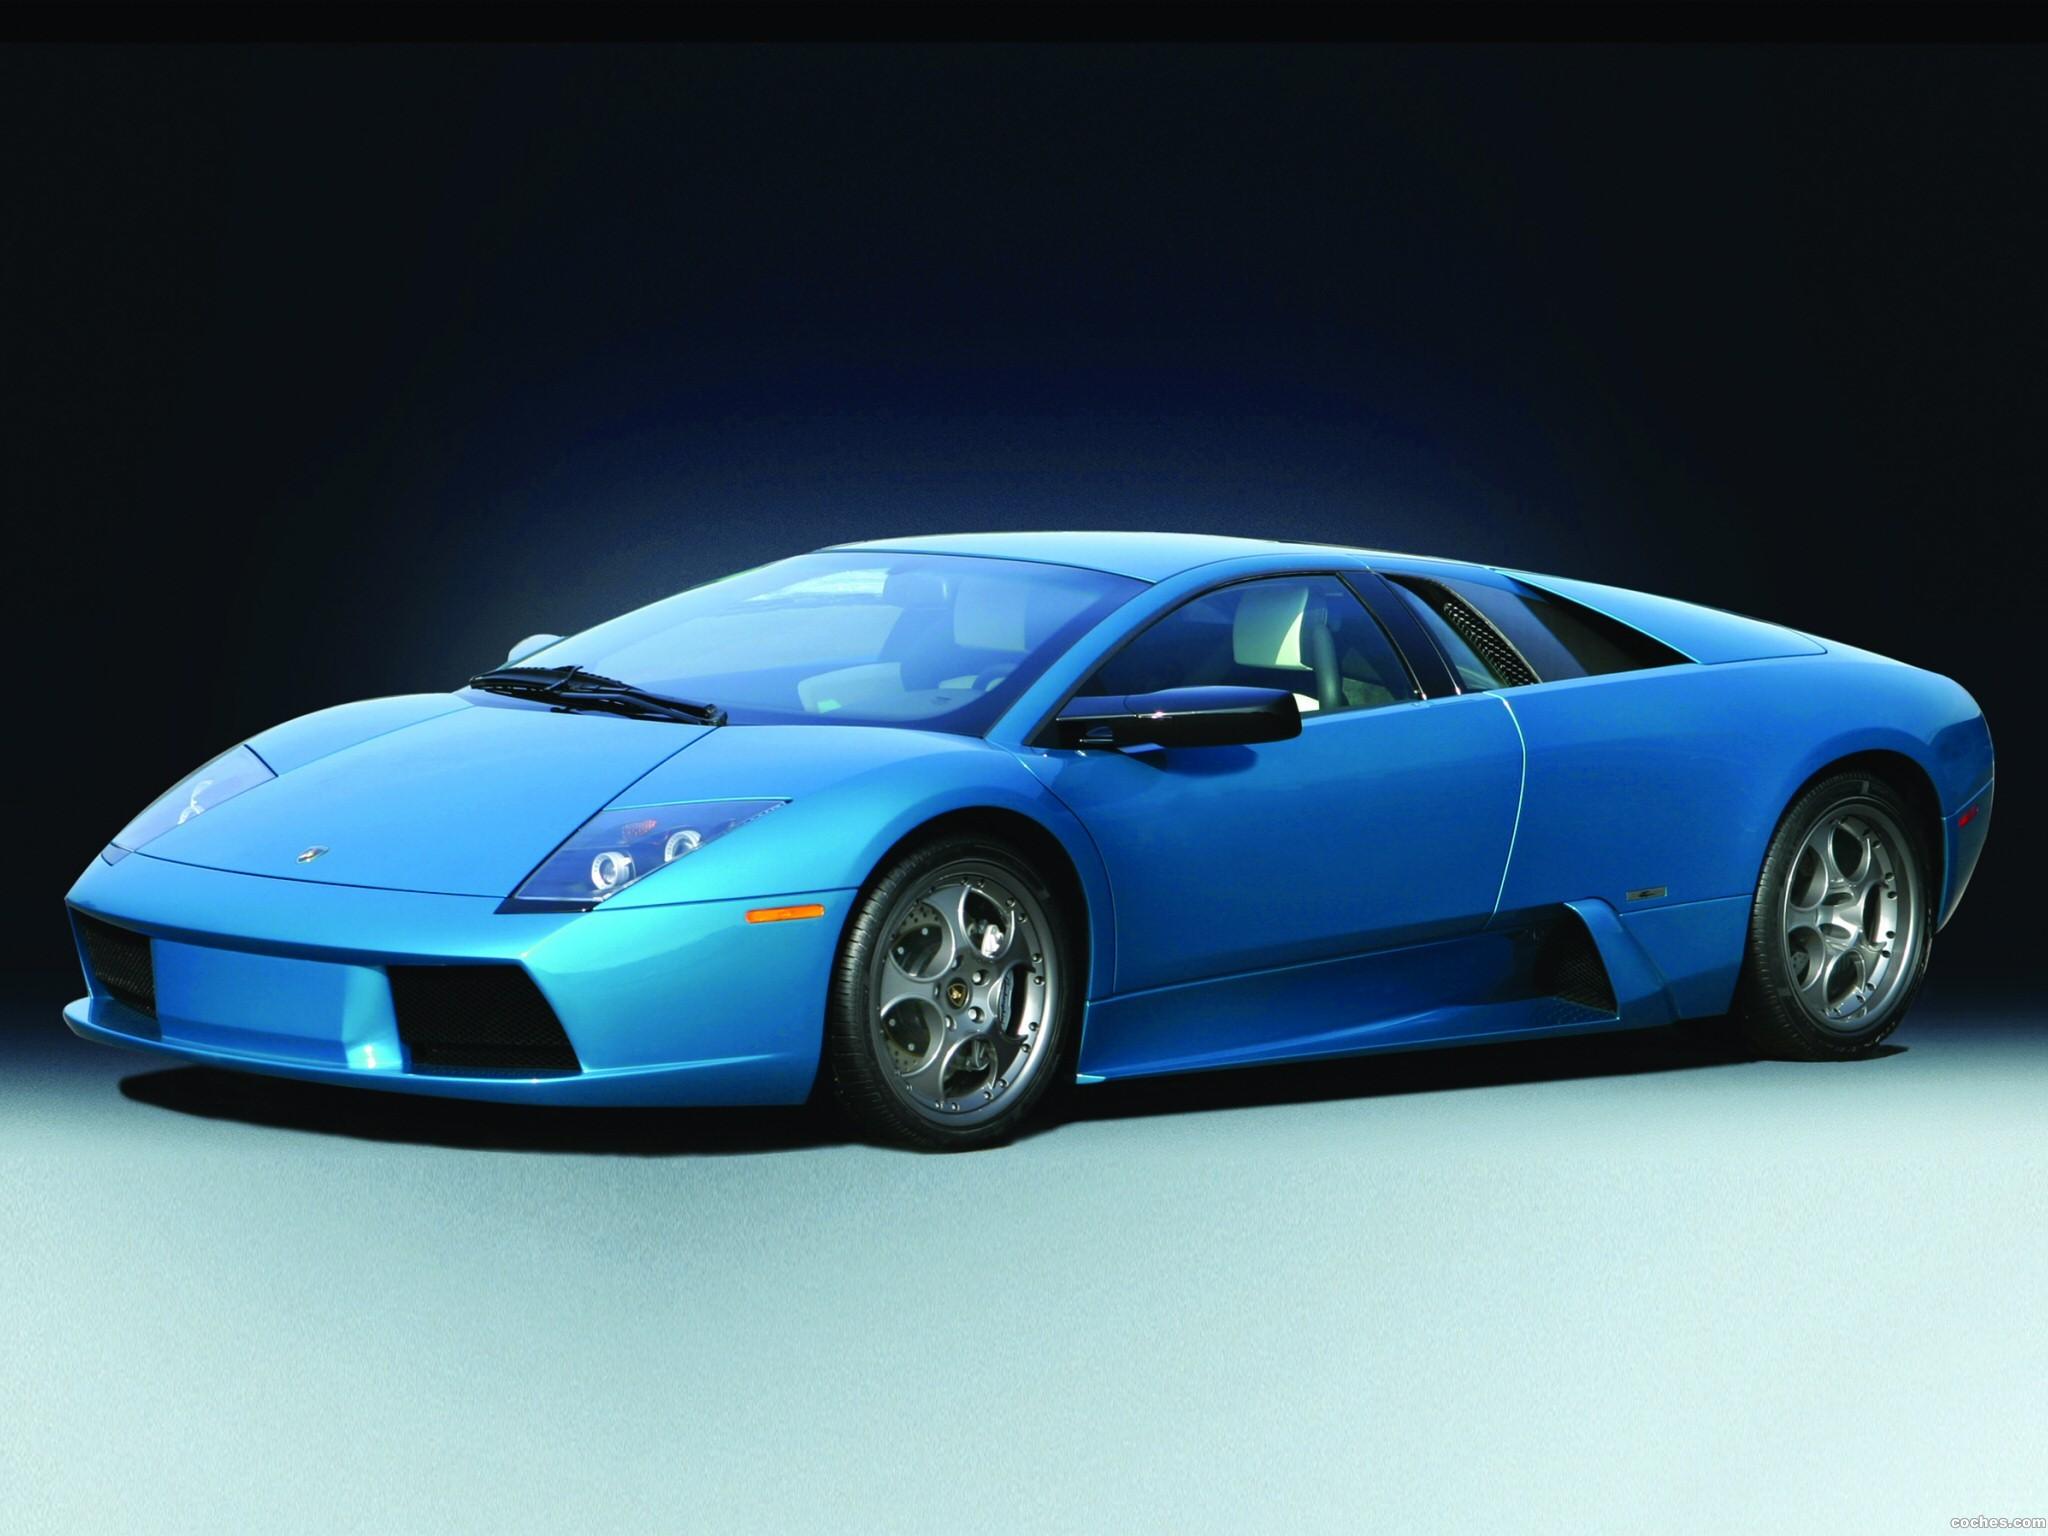 Foto 0 de Lamborghini Murcielago 2002